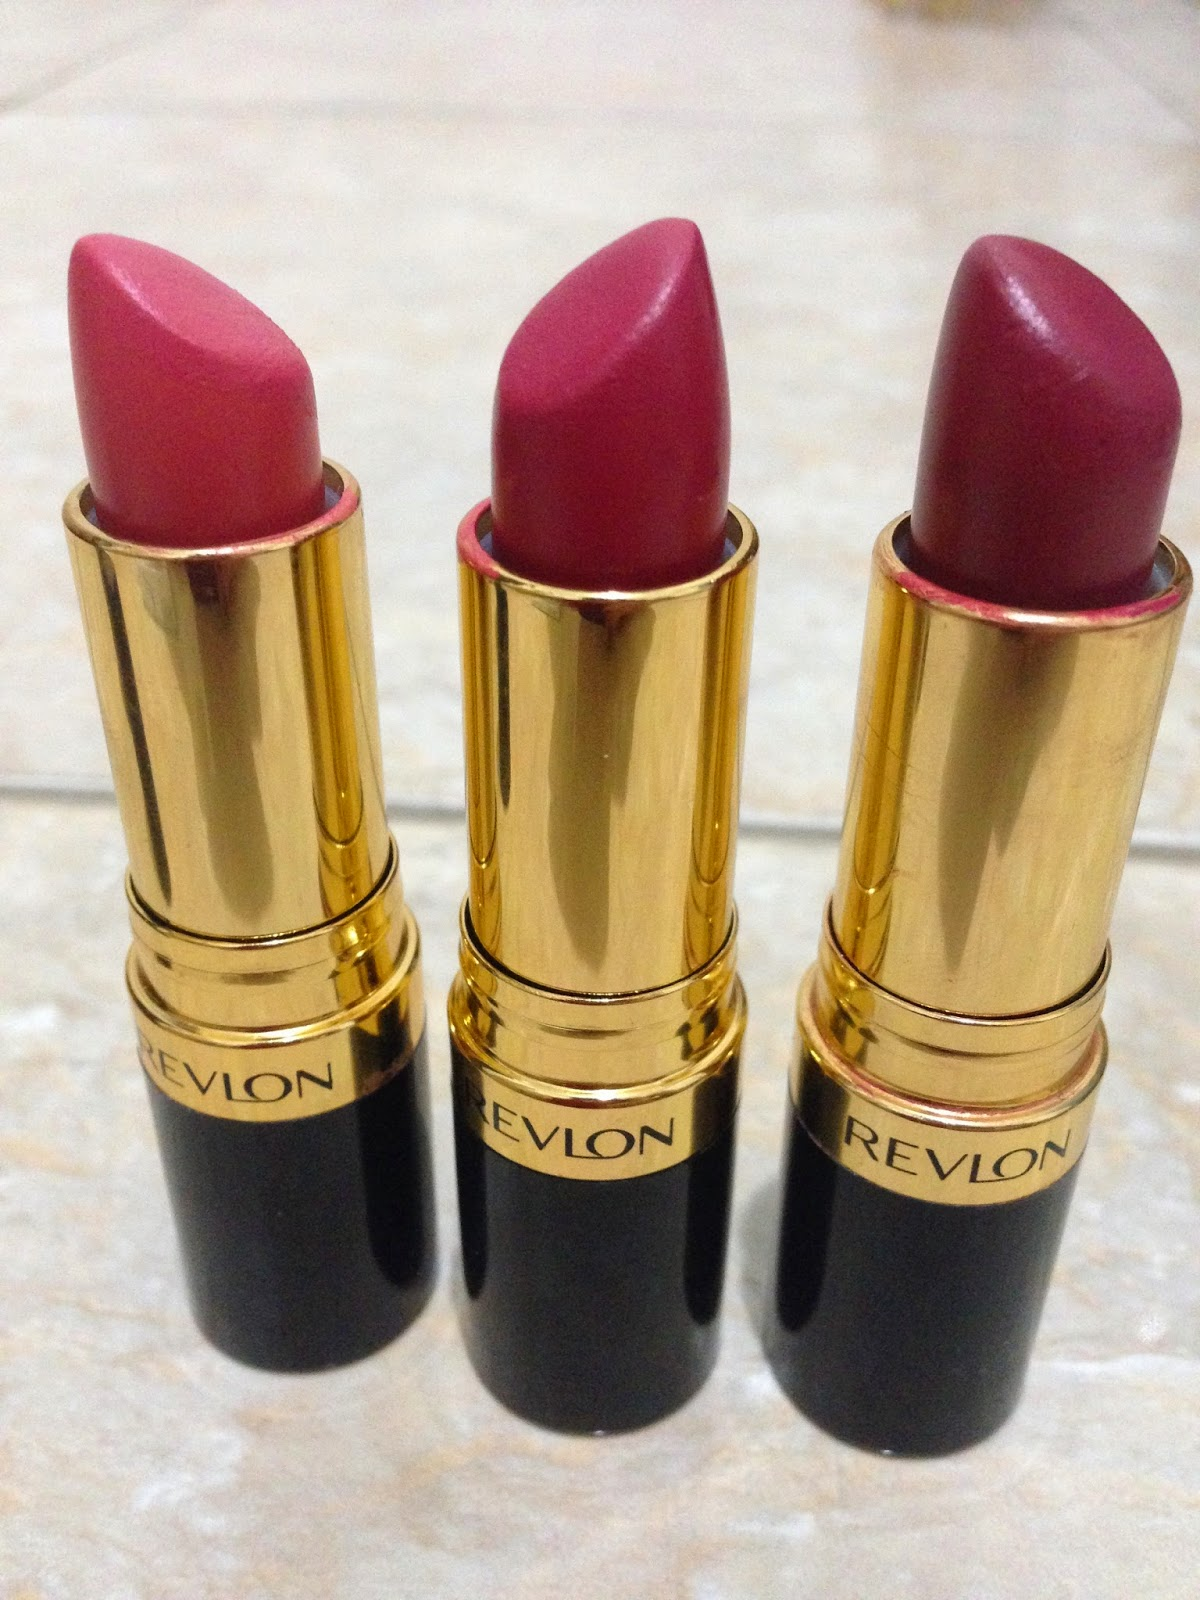 Revlon Lipstick - Walmart.com